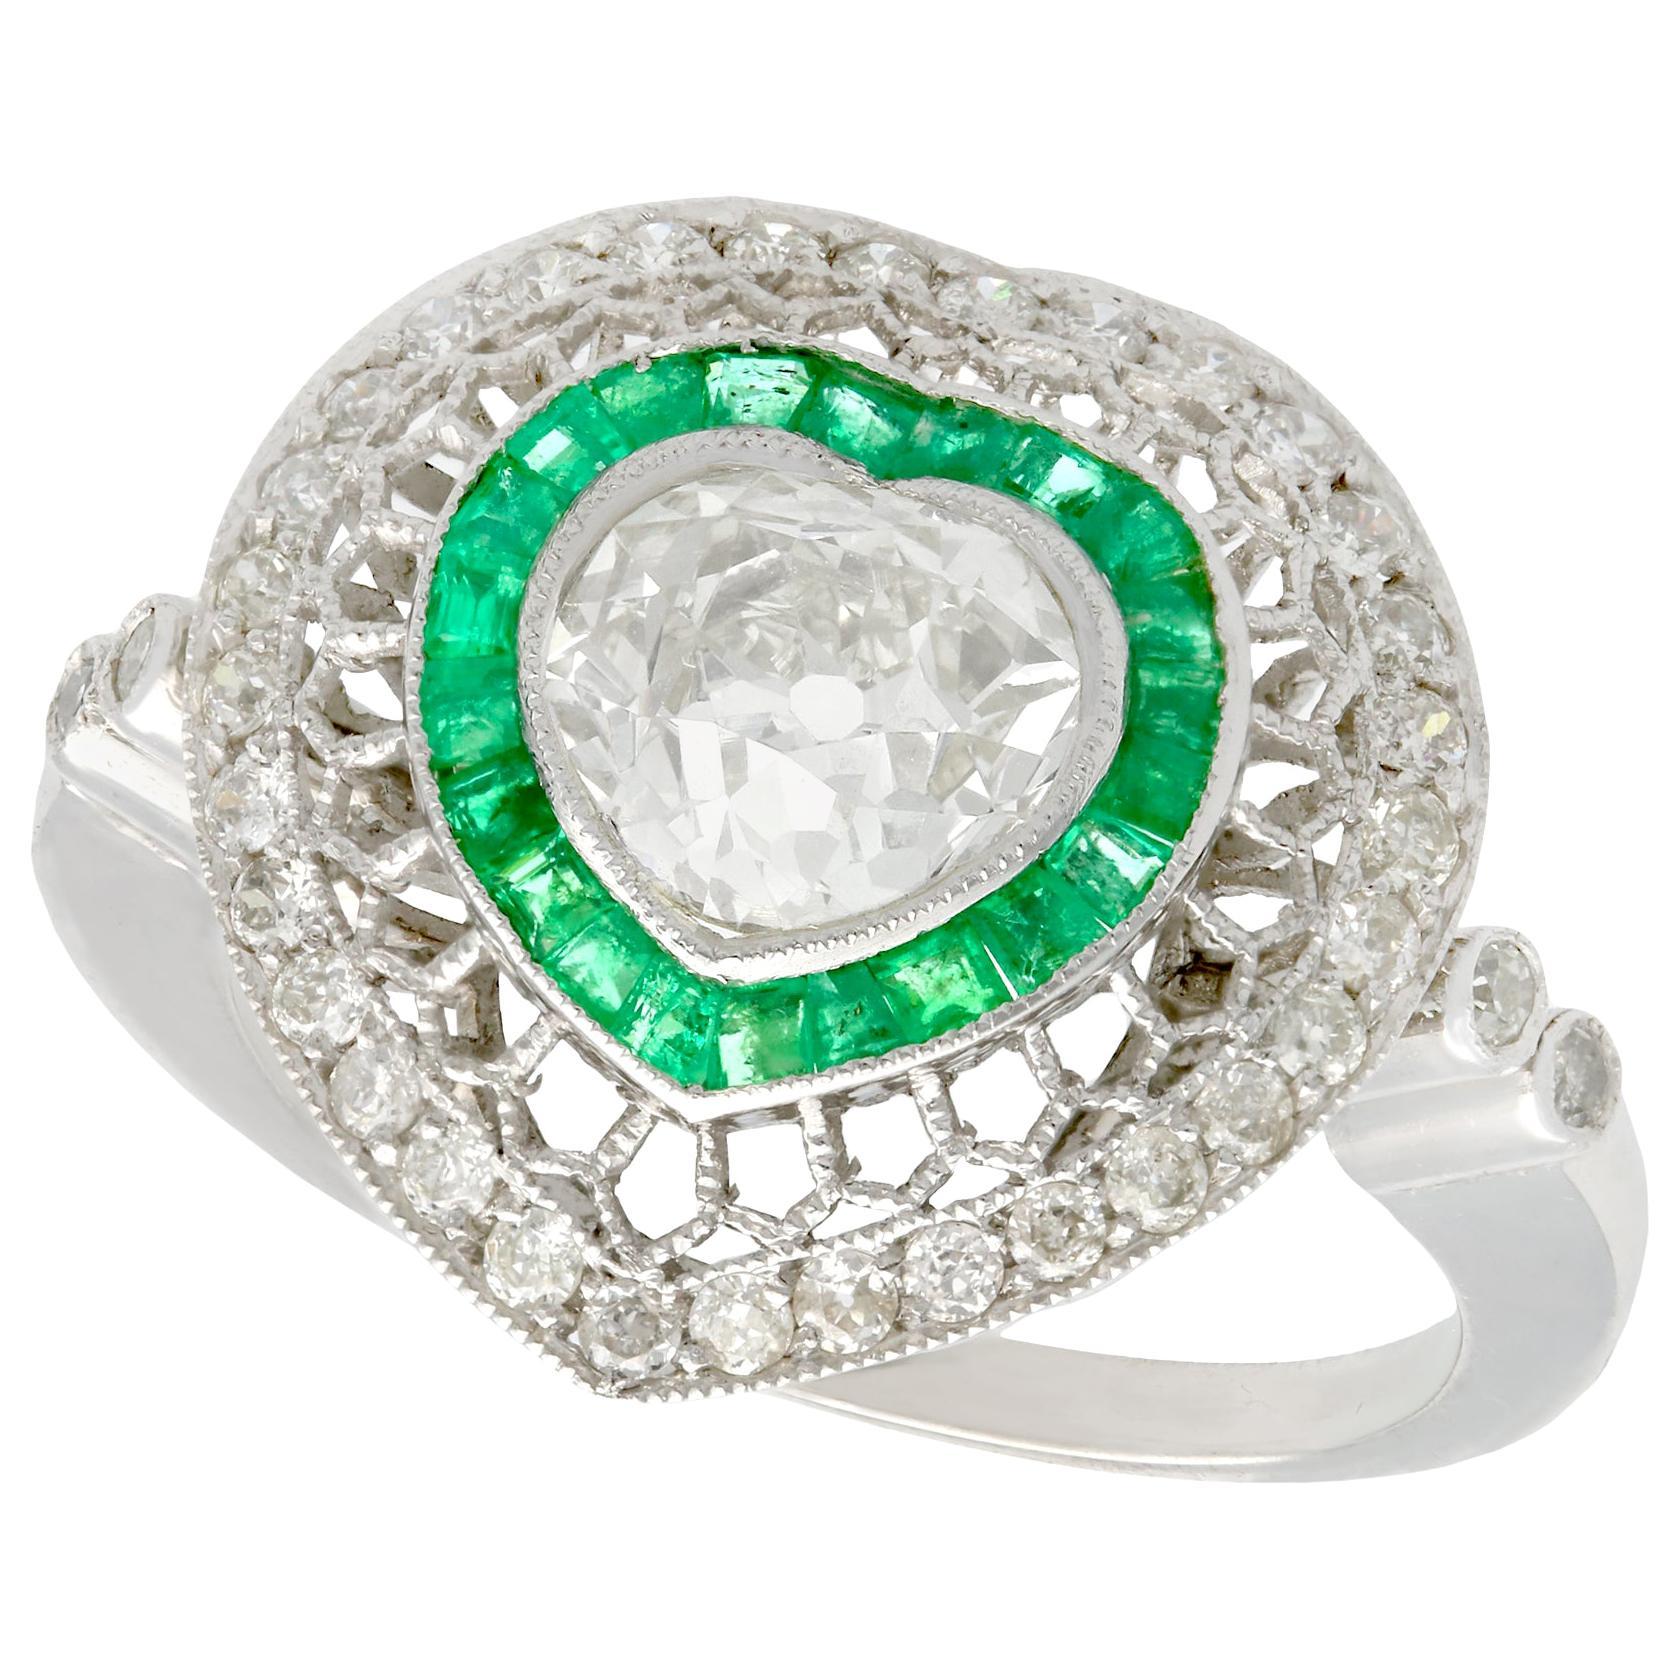 Emerald and 2.62 Carat Diamond Platinum Cocktail Ring